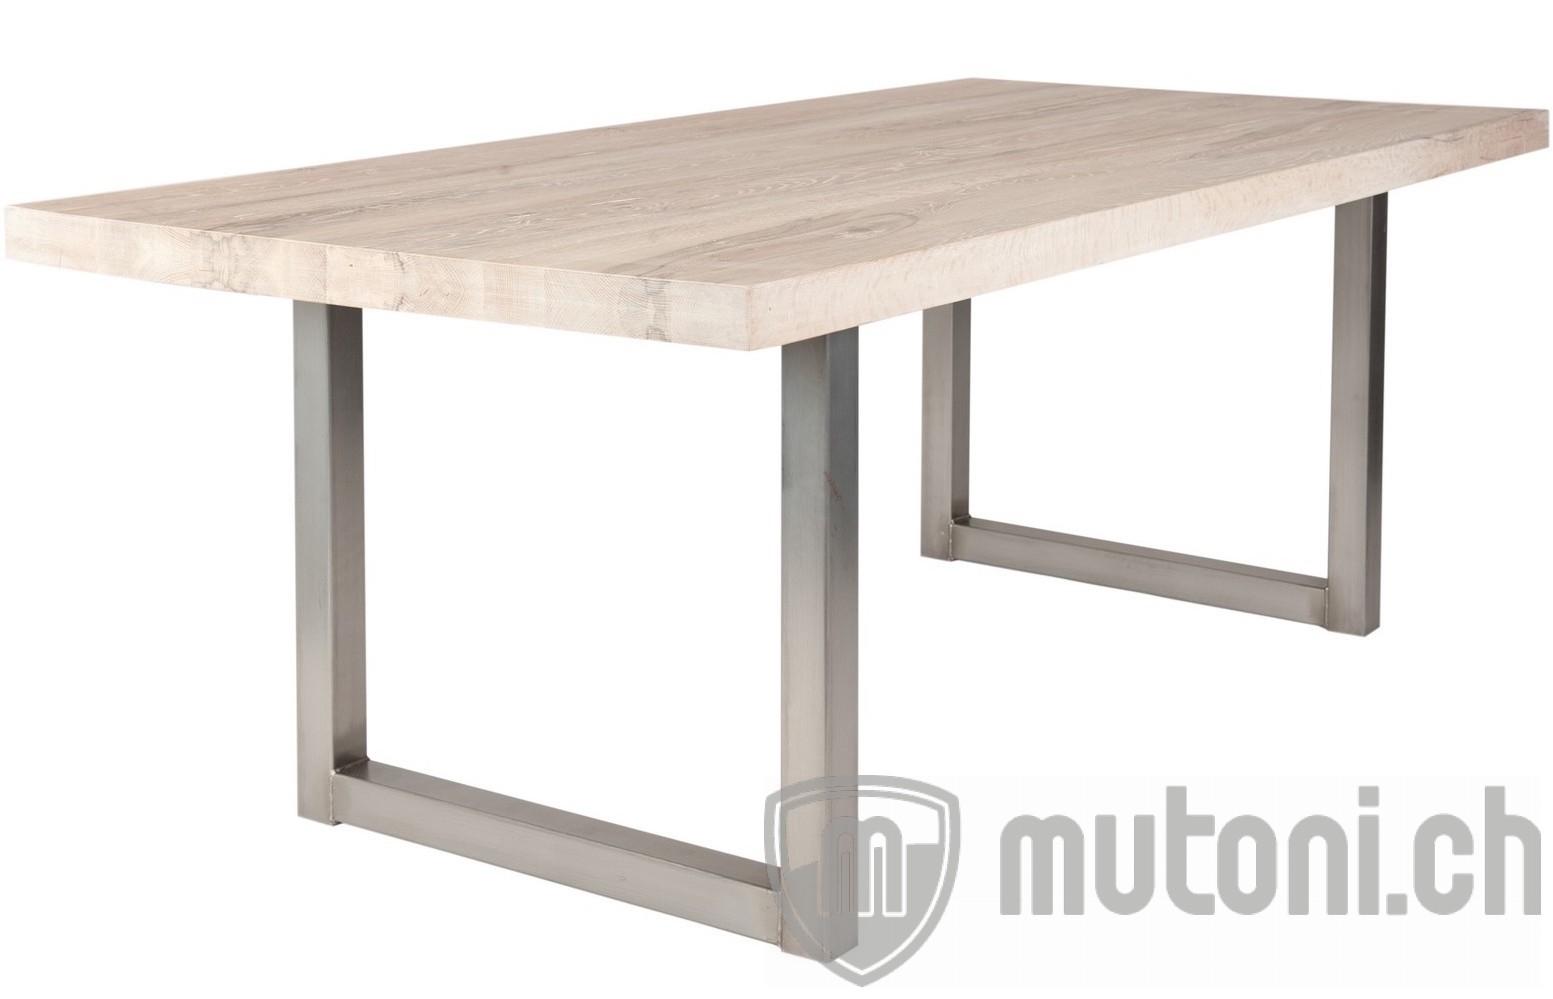 esstisch ottawa eiche rustikal mutoni wood mutoni m bel. Black Bedroom Furniture Sets. Home Design Ideas